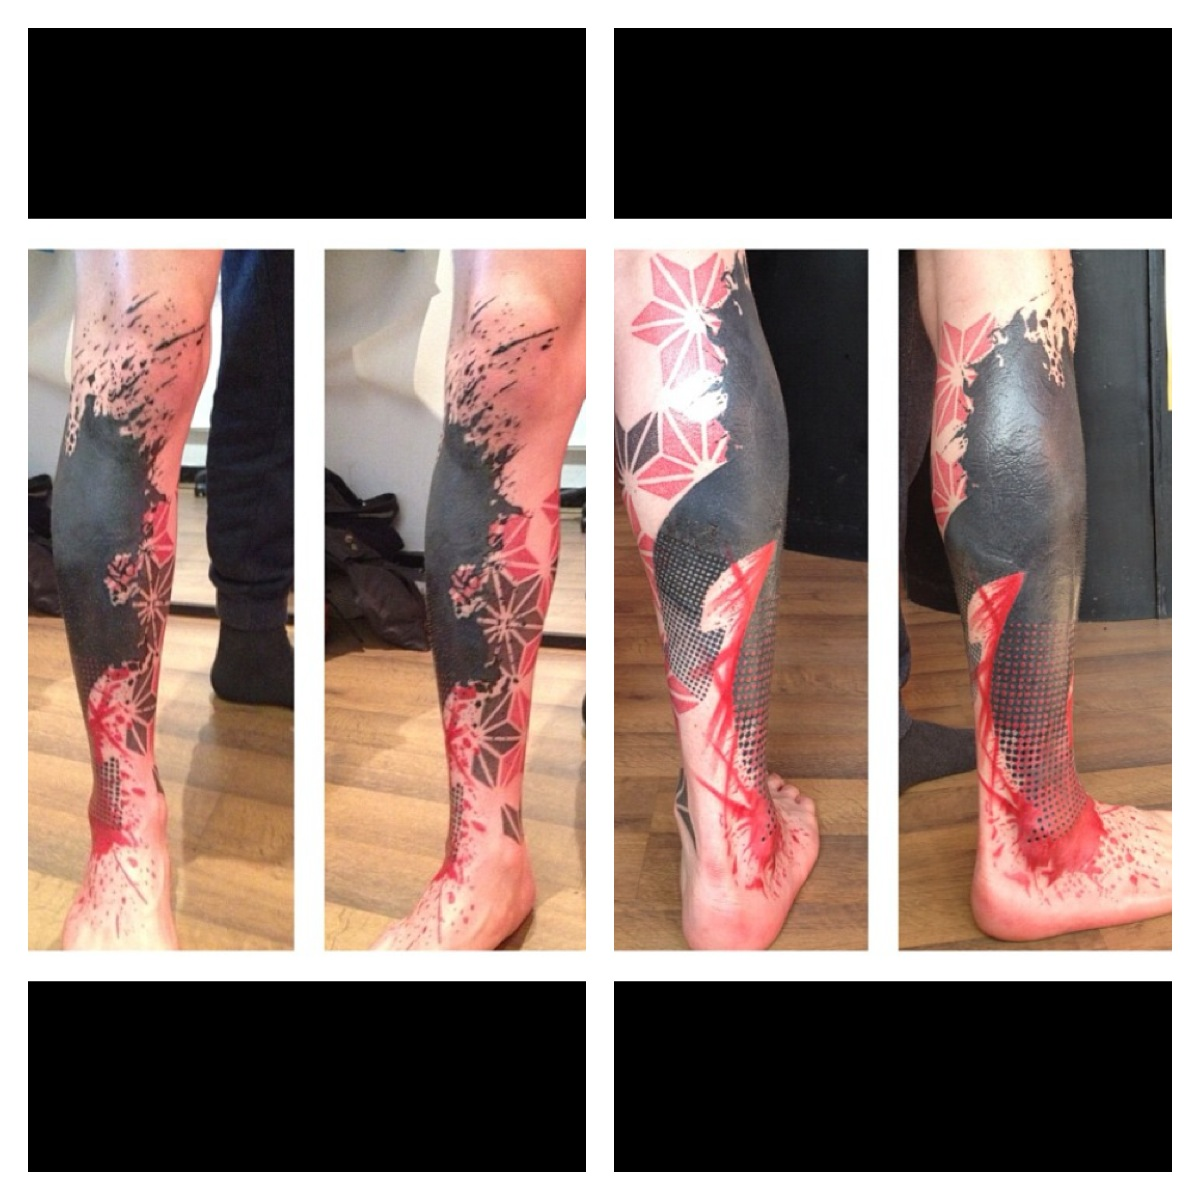 Amazing abstract leg tattoo